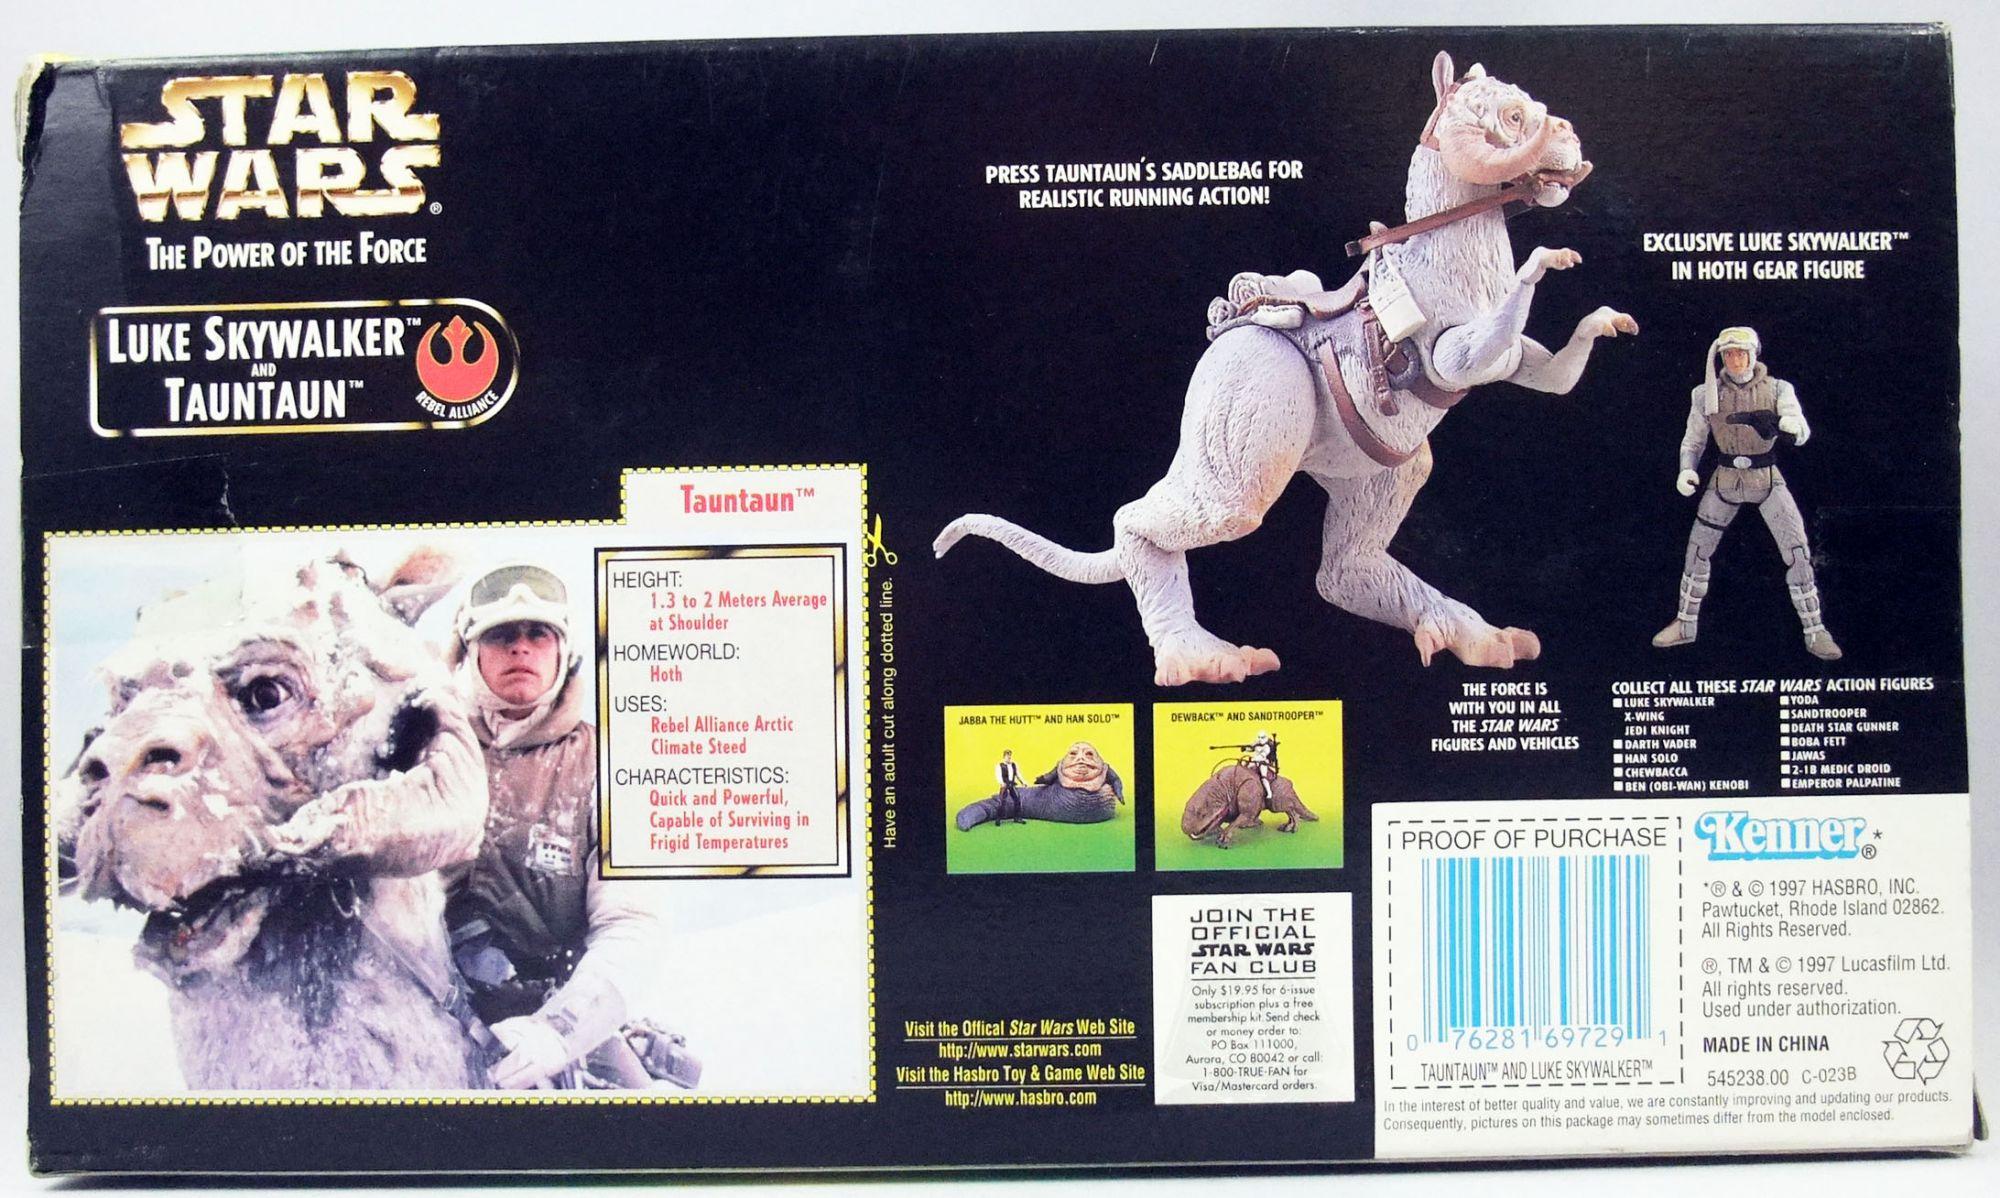 Star Wars (The Power of the Force) - Kenner - Luke Skywalker & Tauntaun